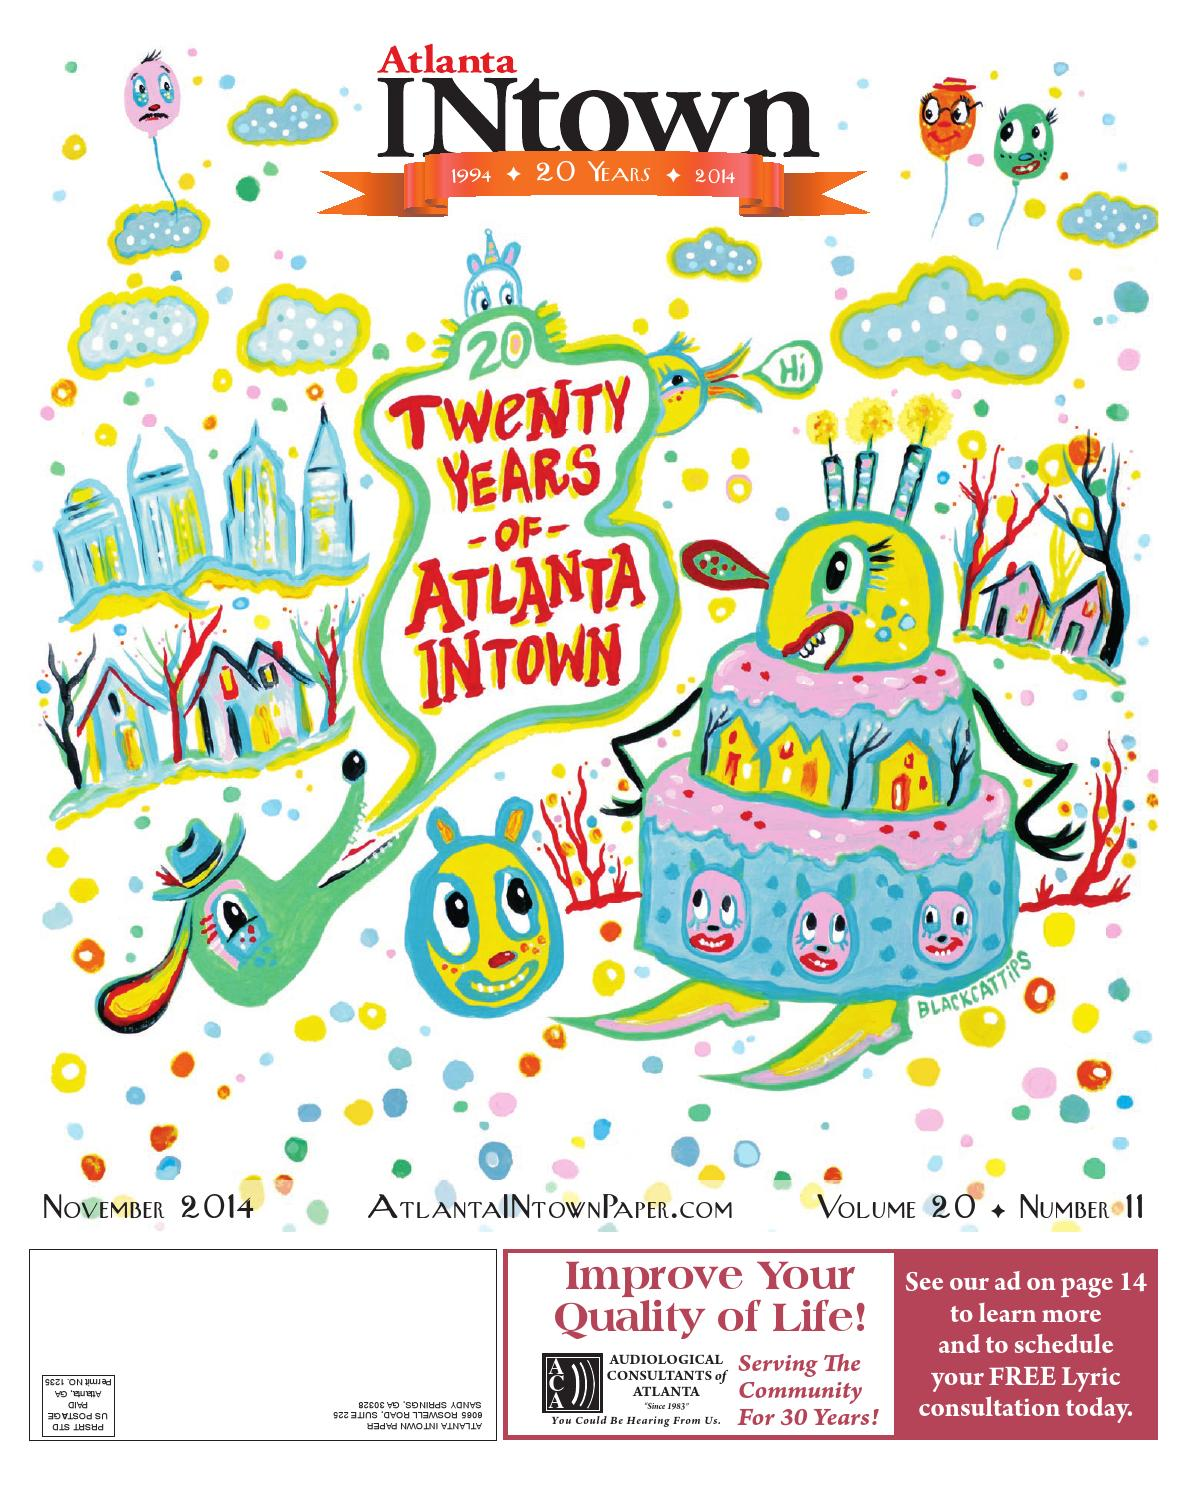 Atlanta intown 20th anniversary edition november 2014 by atlanta atlanta intown 20th anniversary edition november 2014 by atlanta intown issuu fandeluxe Image collections